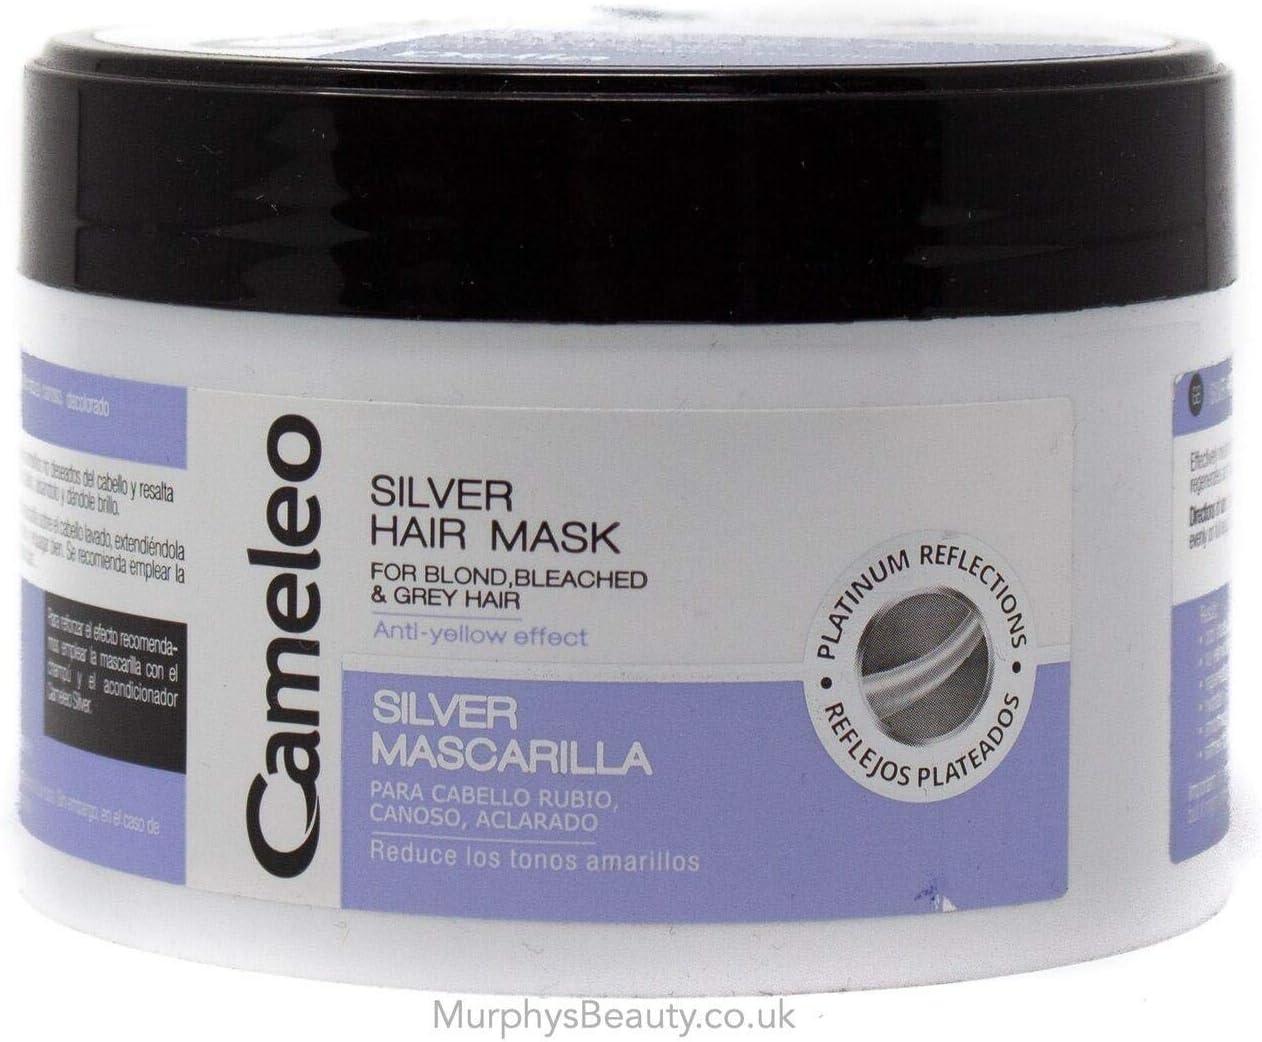 Máscara de plata para cabello de Delia, rubio blanqueado, pelo gris, anti efecto amarillo 200ml